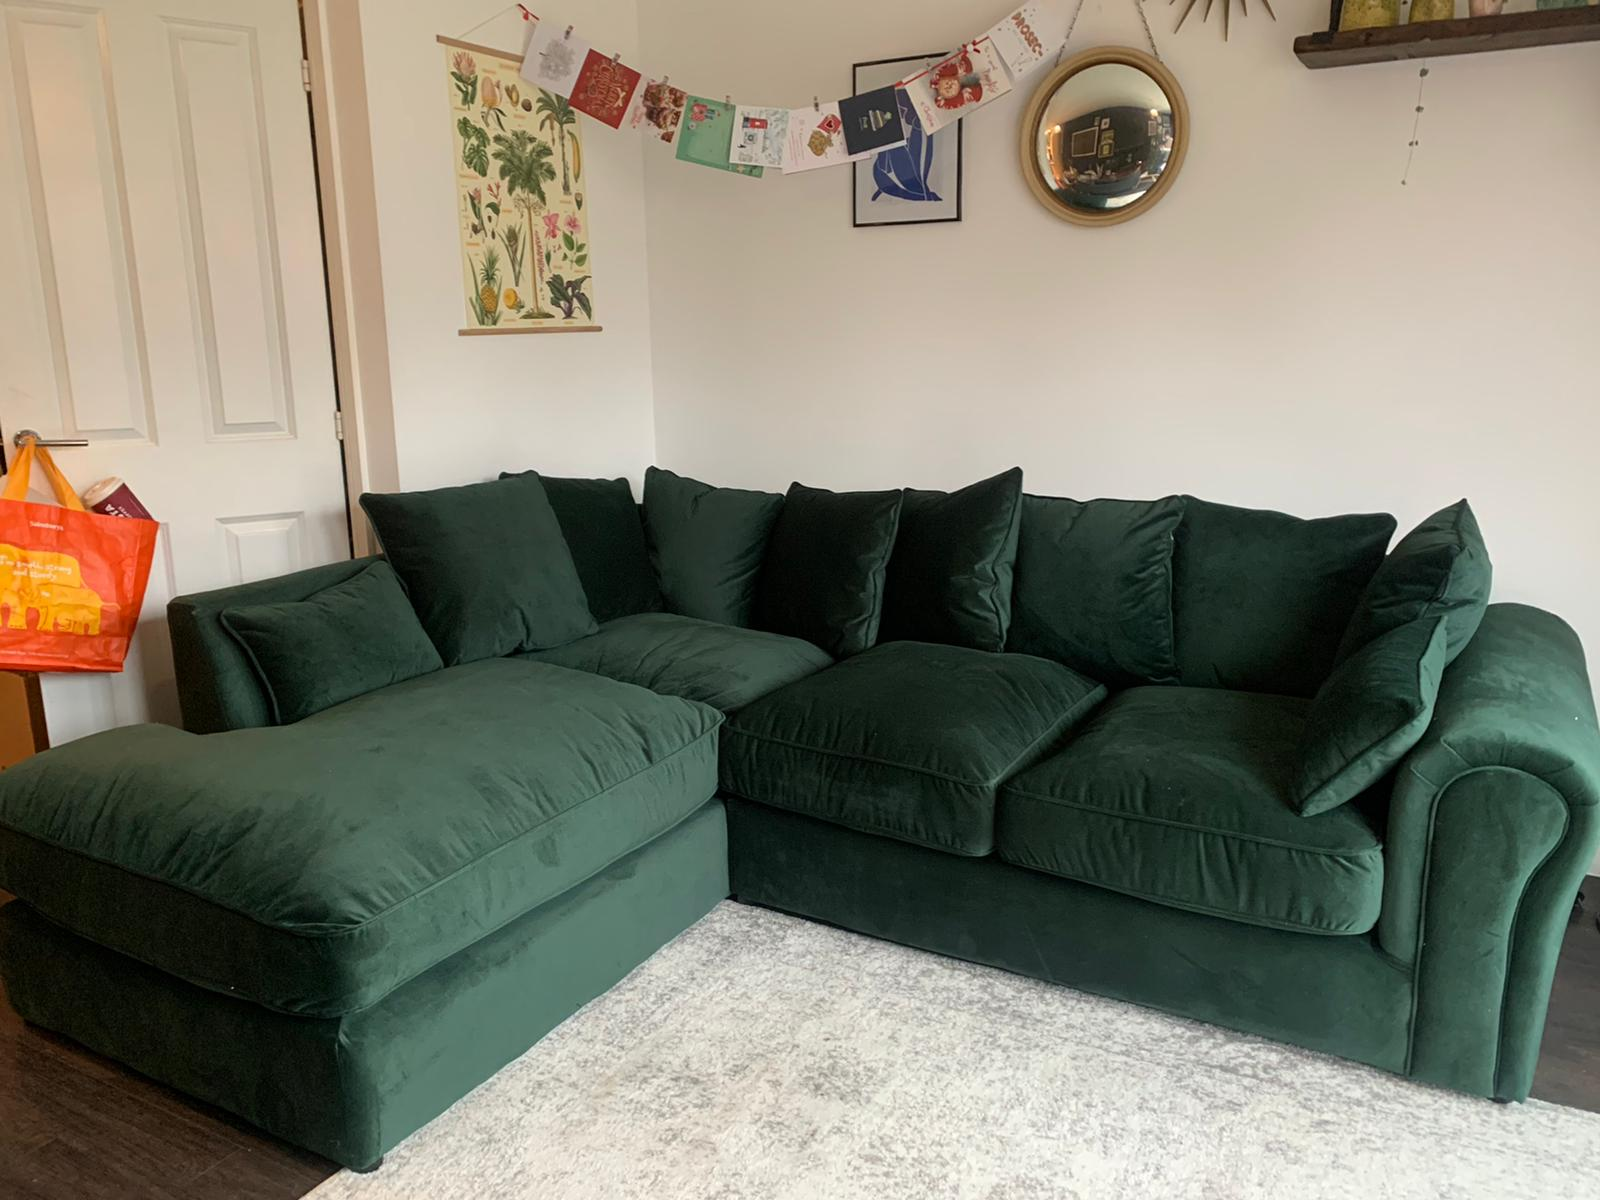 Baron bottle corner sofa